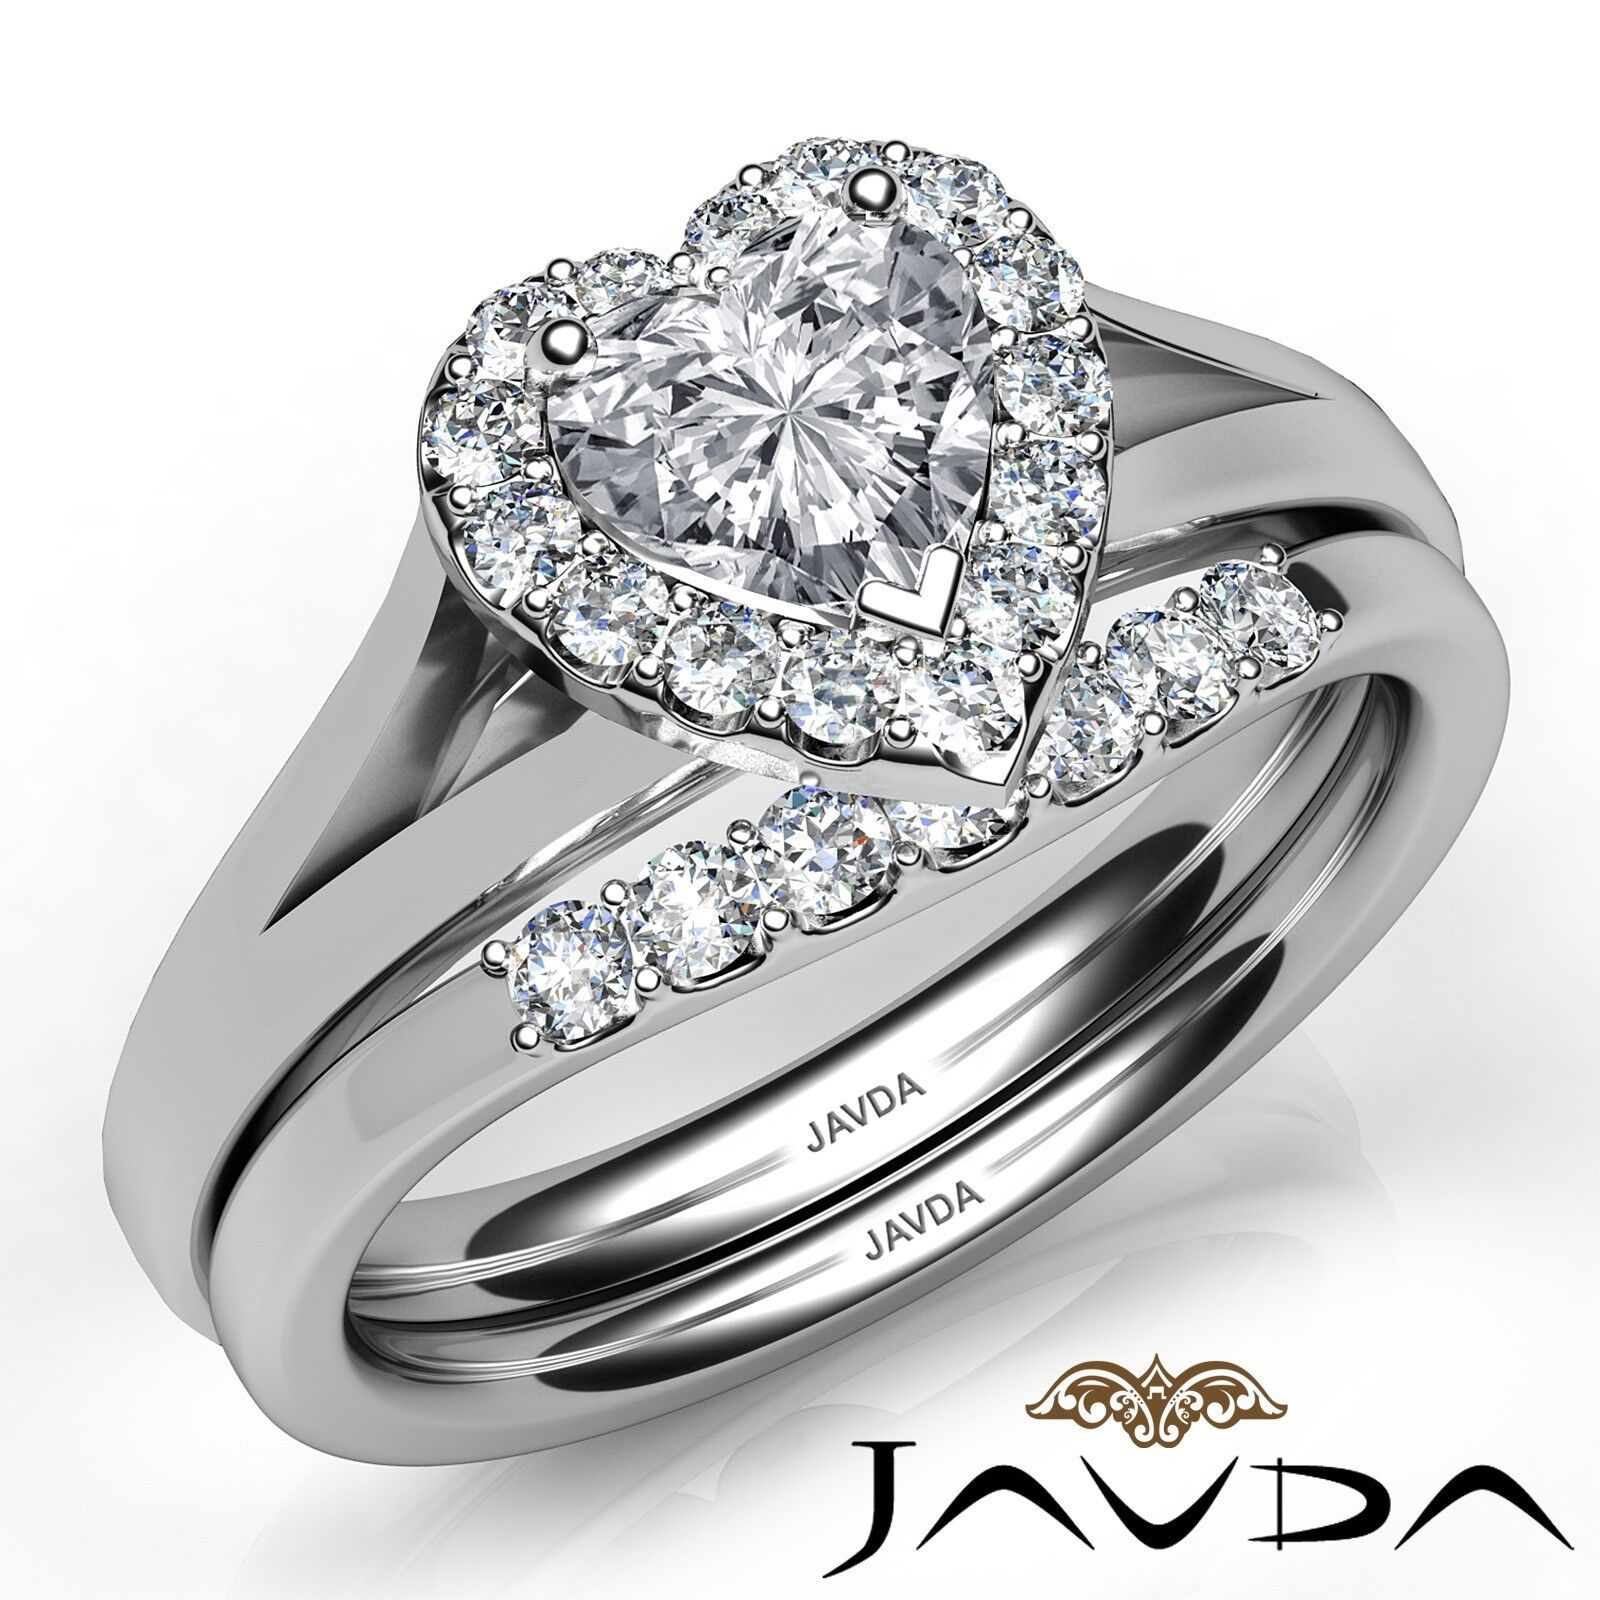 1.22ctw Pave Halo Bridal Set Heart Diamond Engagement Ring GIA G-VVS2 White Gold 1